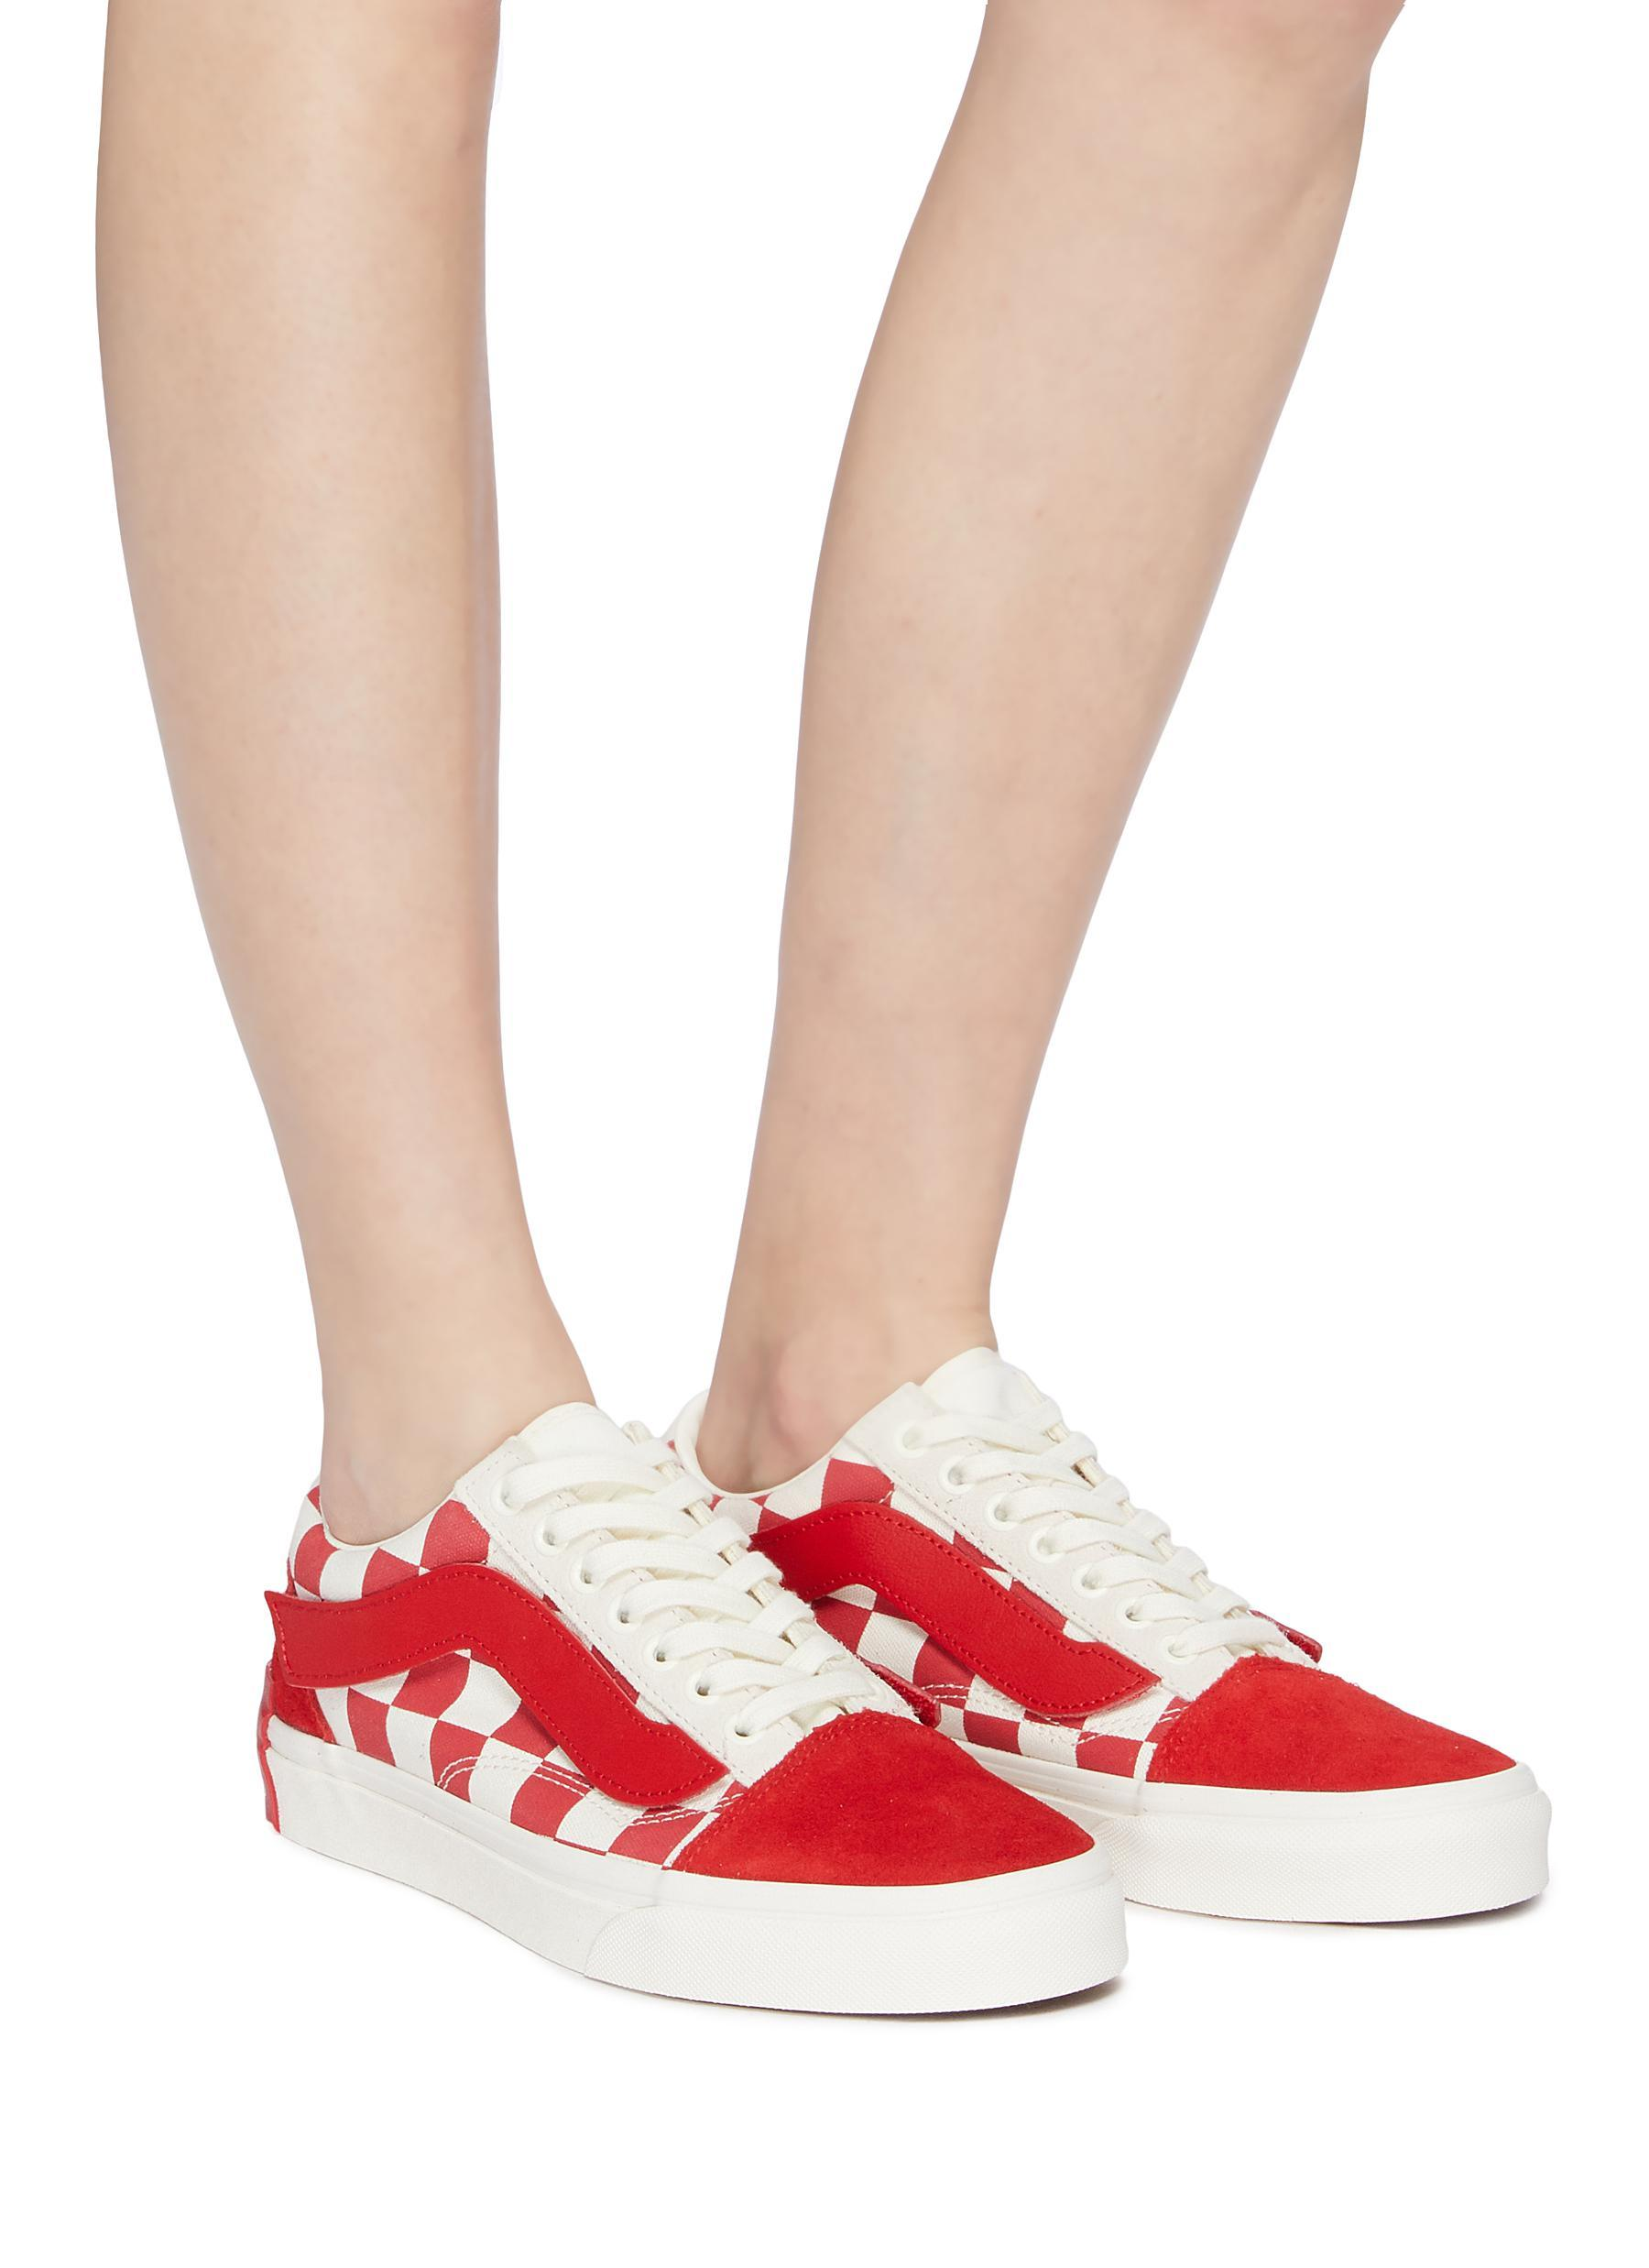 723009739fde Vans - Red X Purlicue  old Skool  Checkerboard Canvas Skate Sneakers for  Men -. View fullscreen